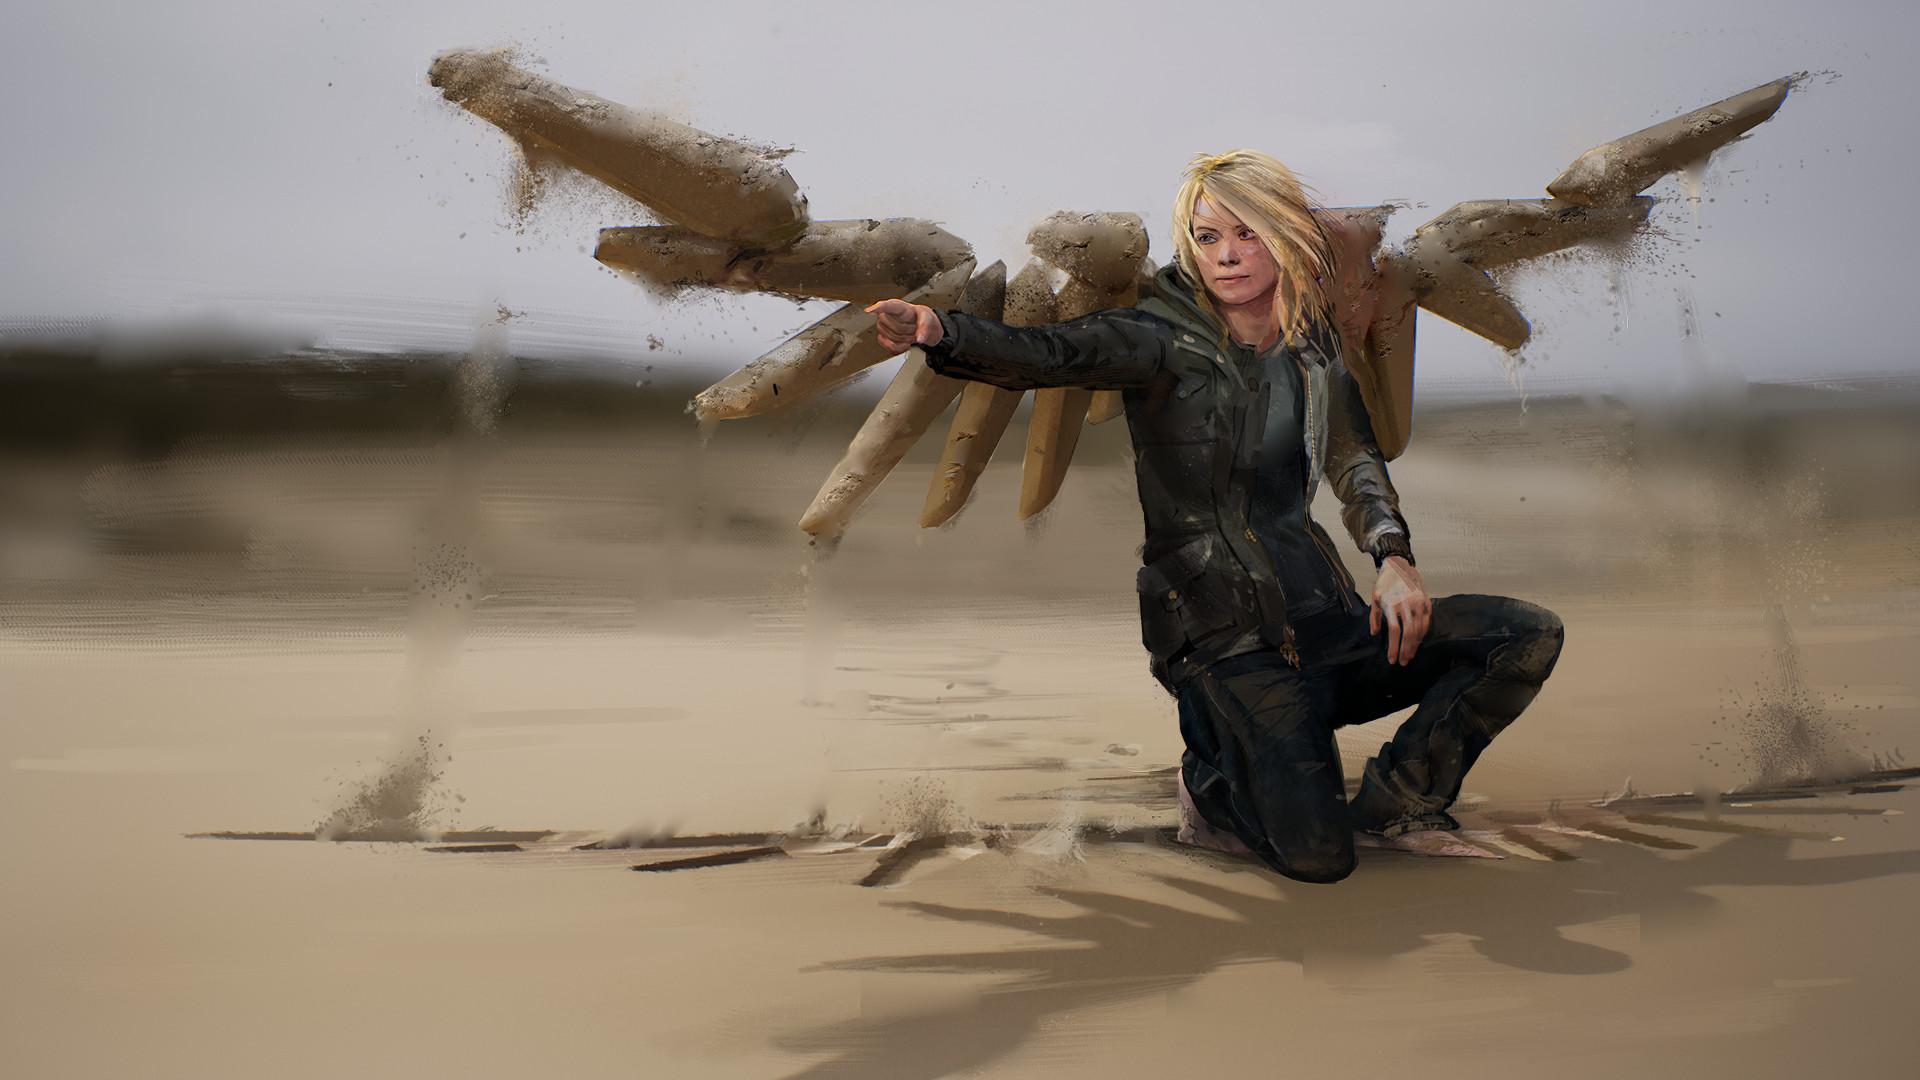 Phoebe herring ange